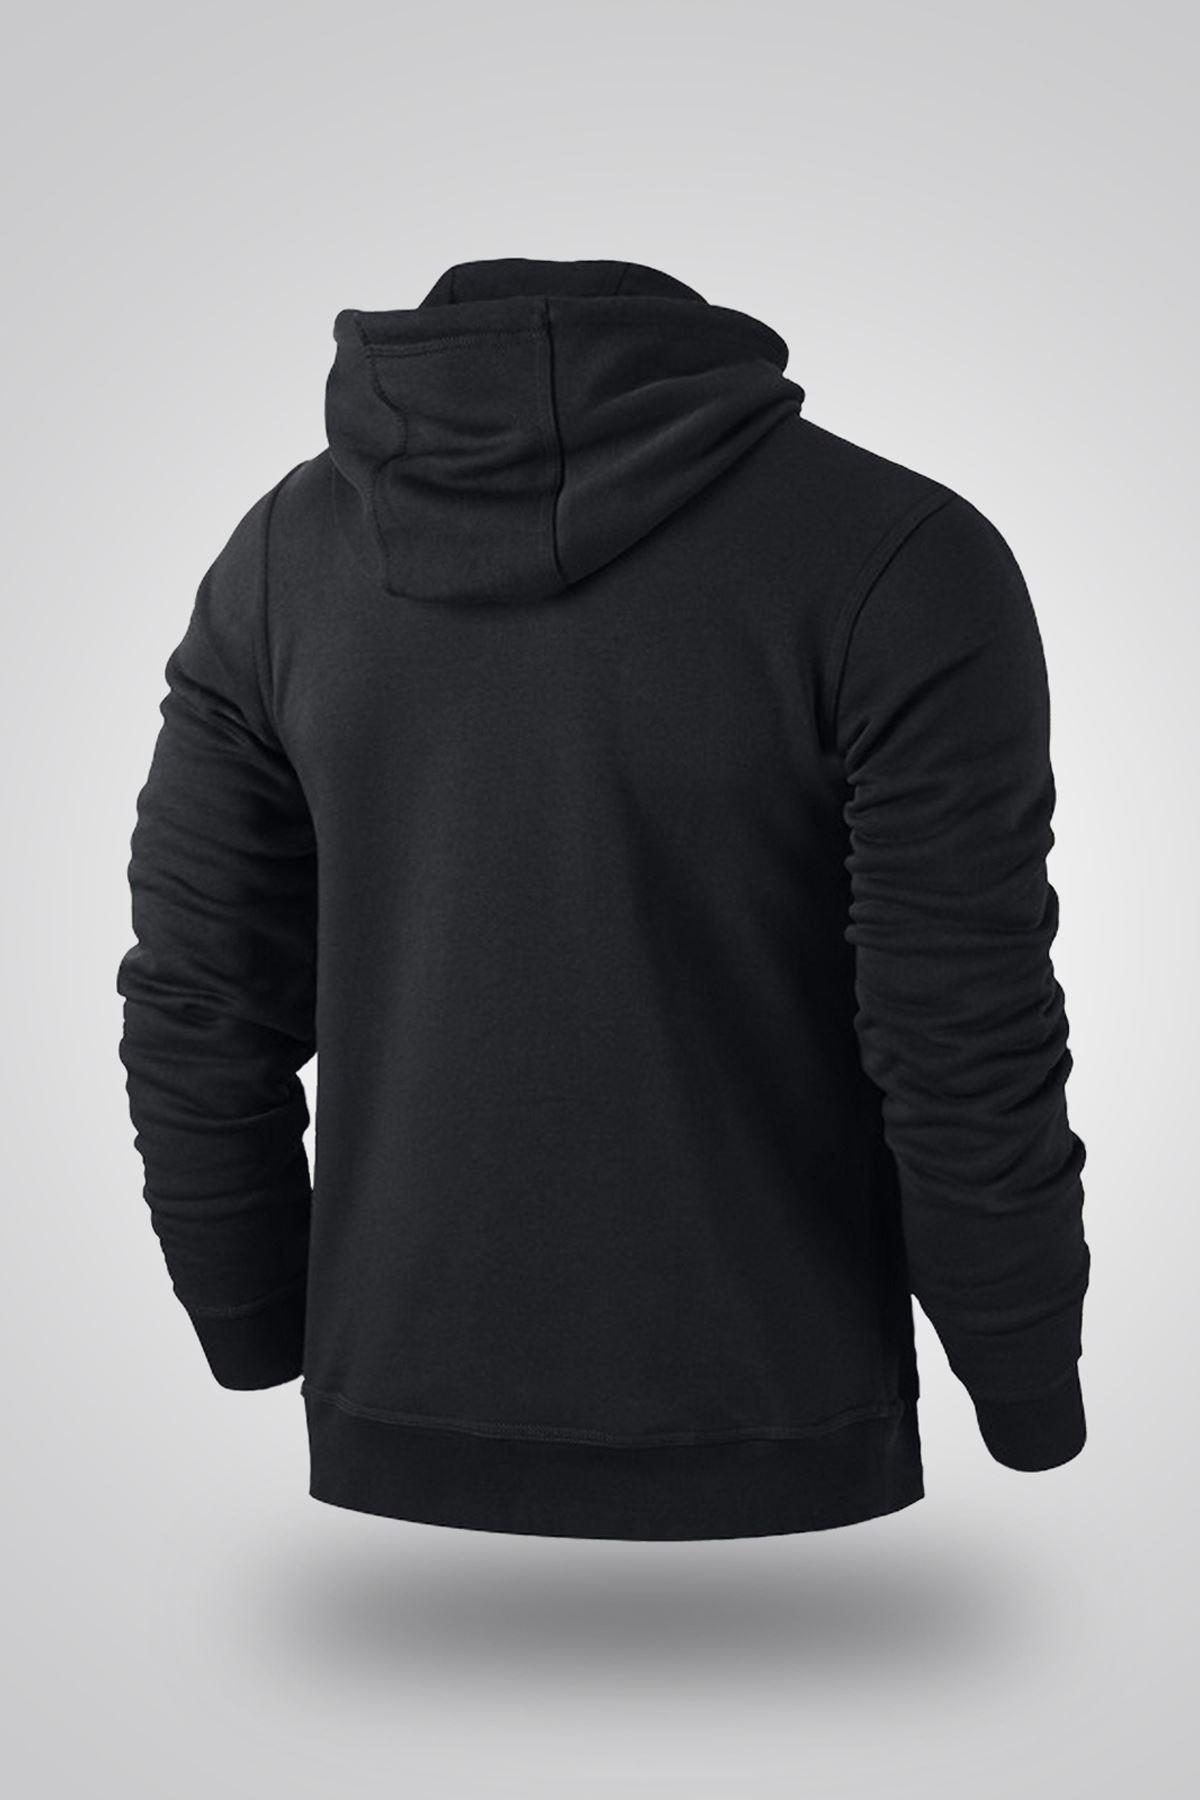 Air Jordan 06 Siyah NBA Erkek Kapşonlu Sweatshirt - Hoodie